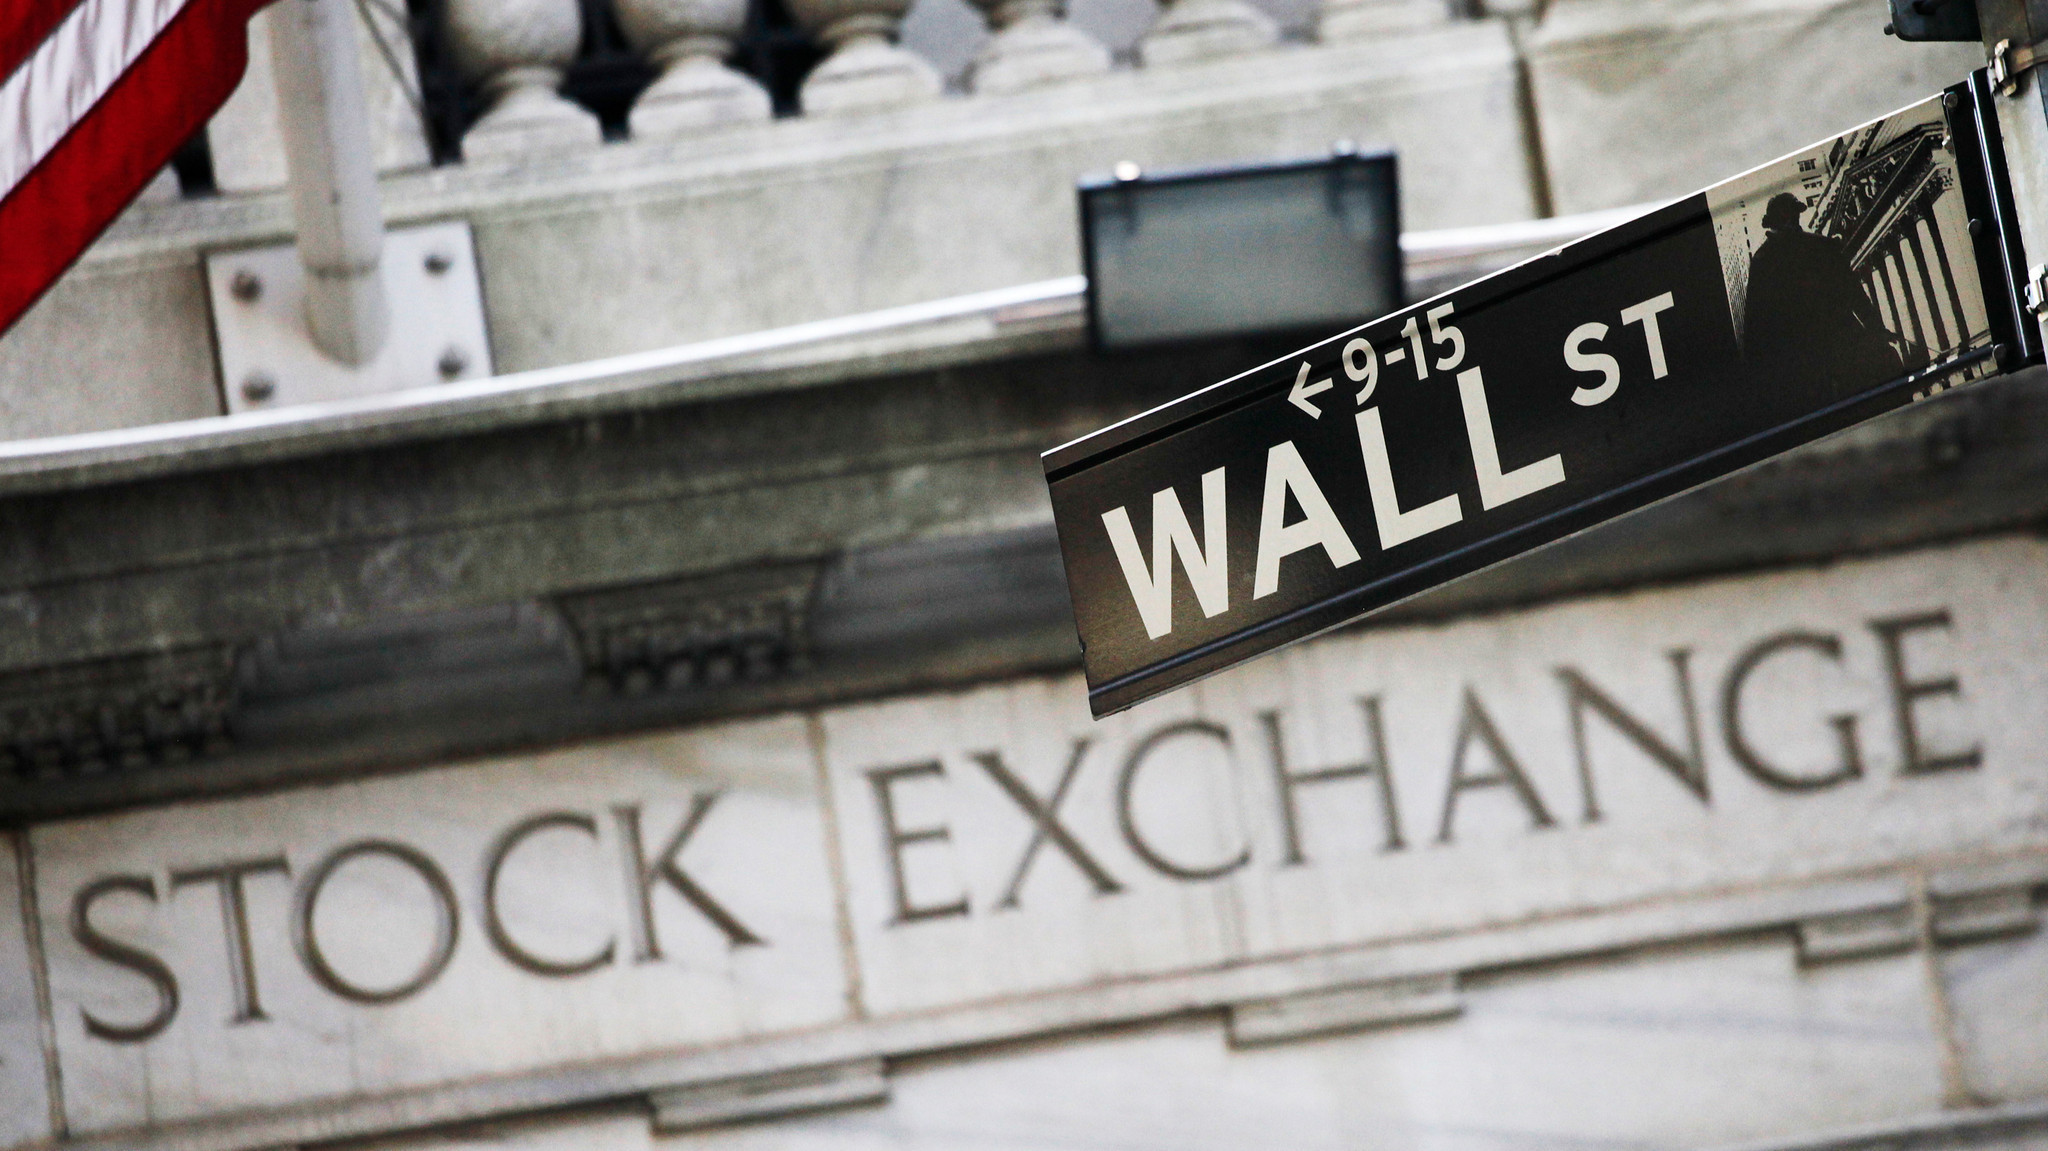 Stocks notch modest but steady gains; home builders soar - LA Times